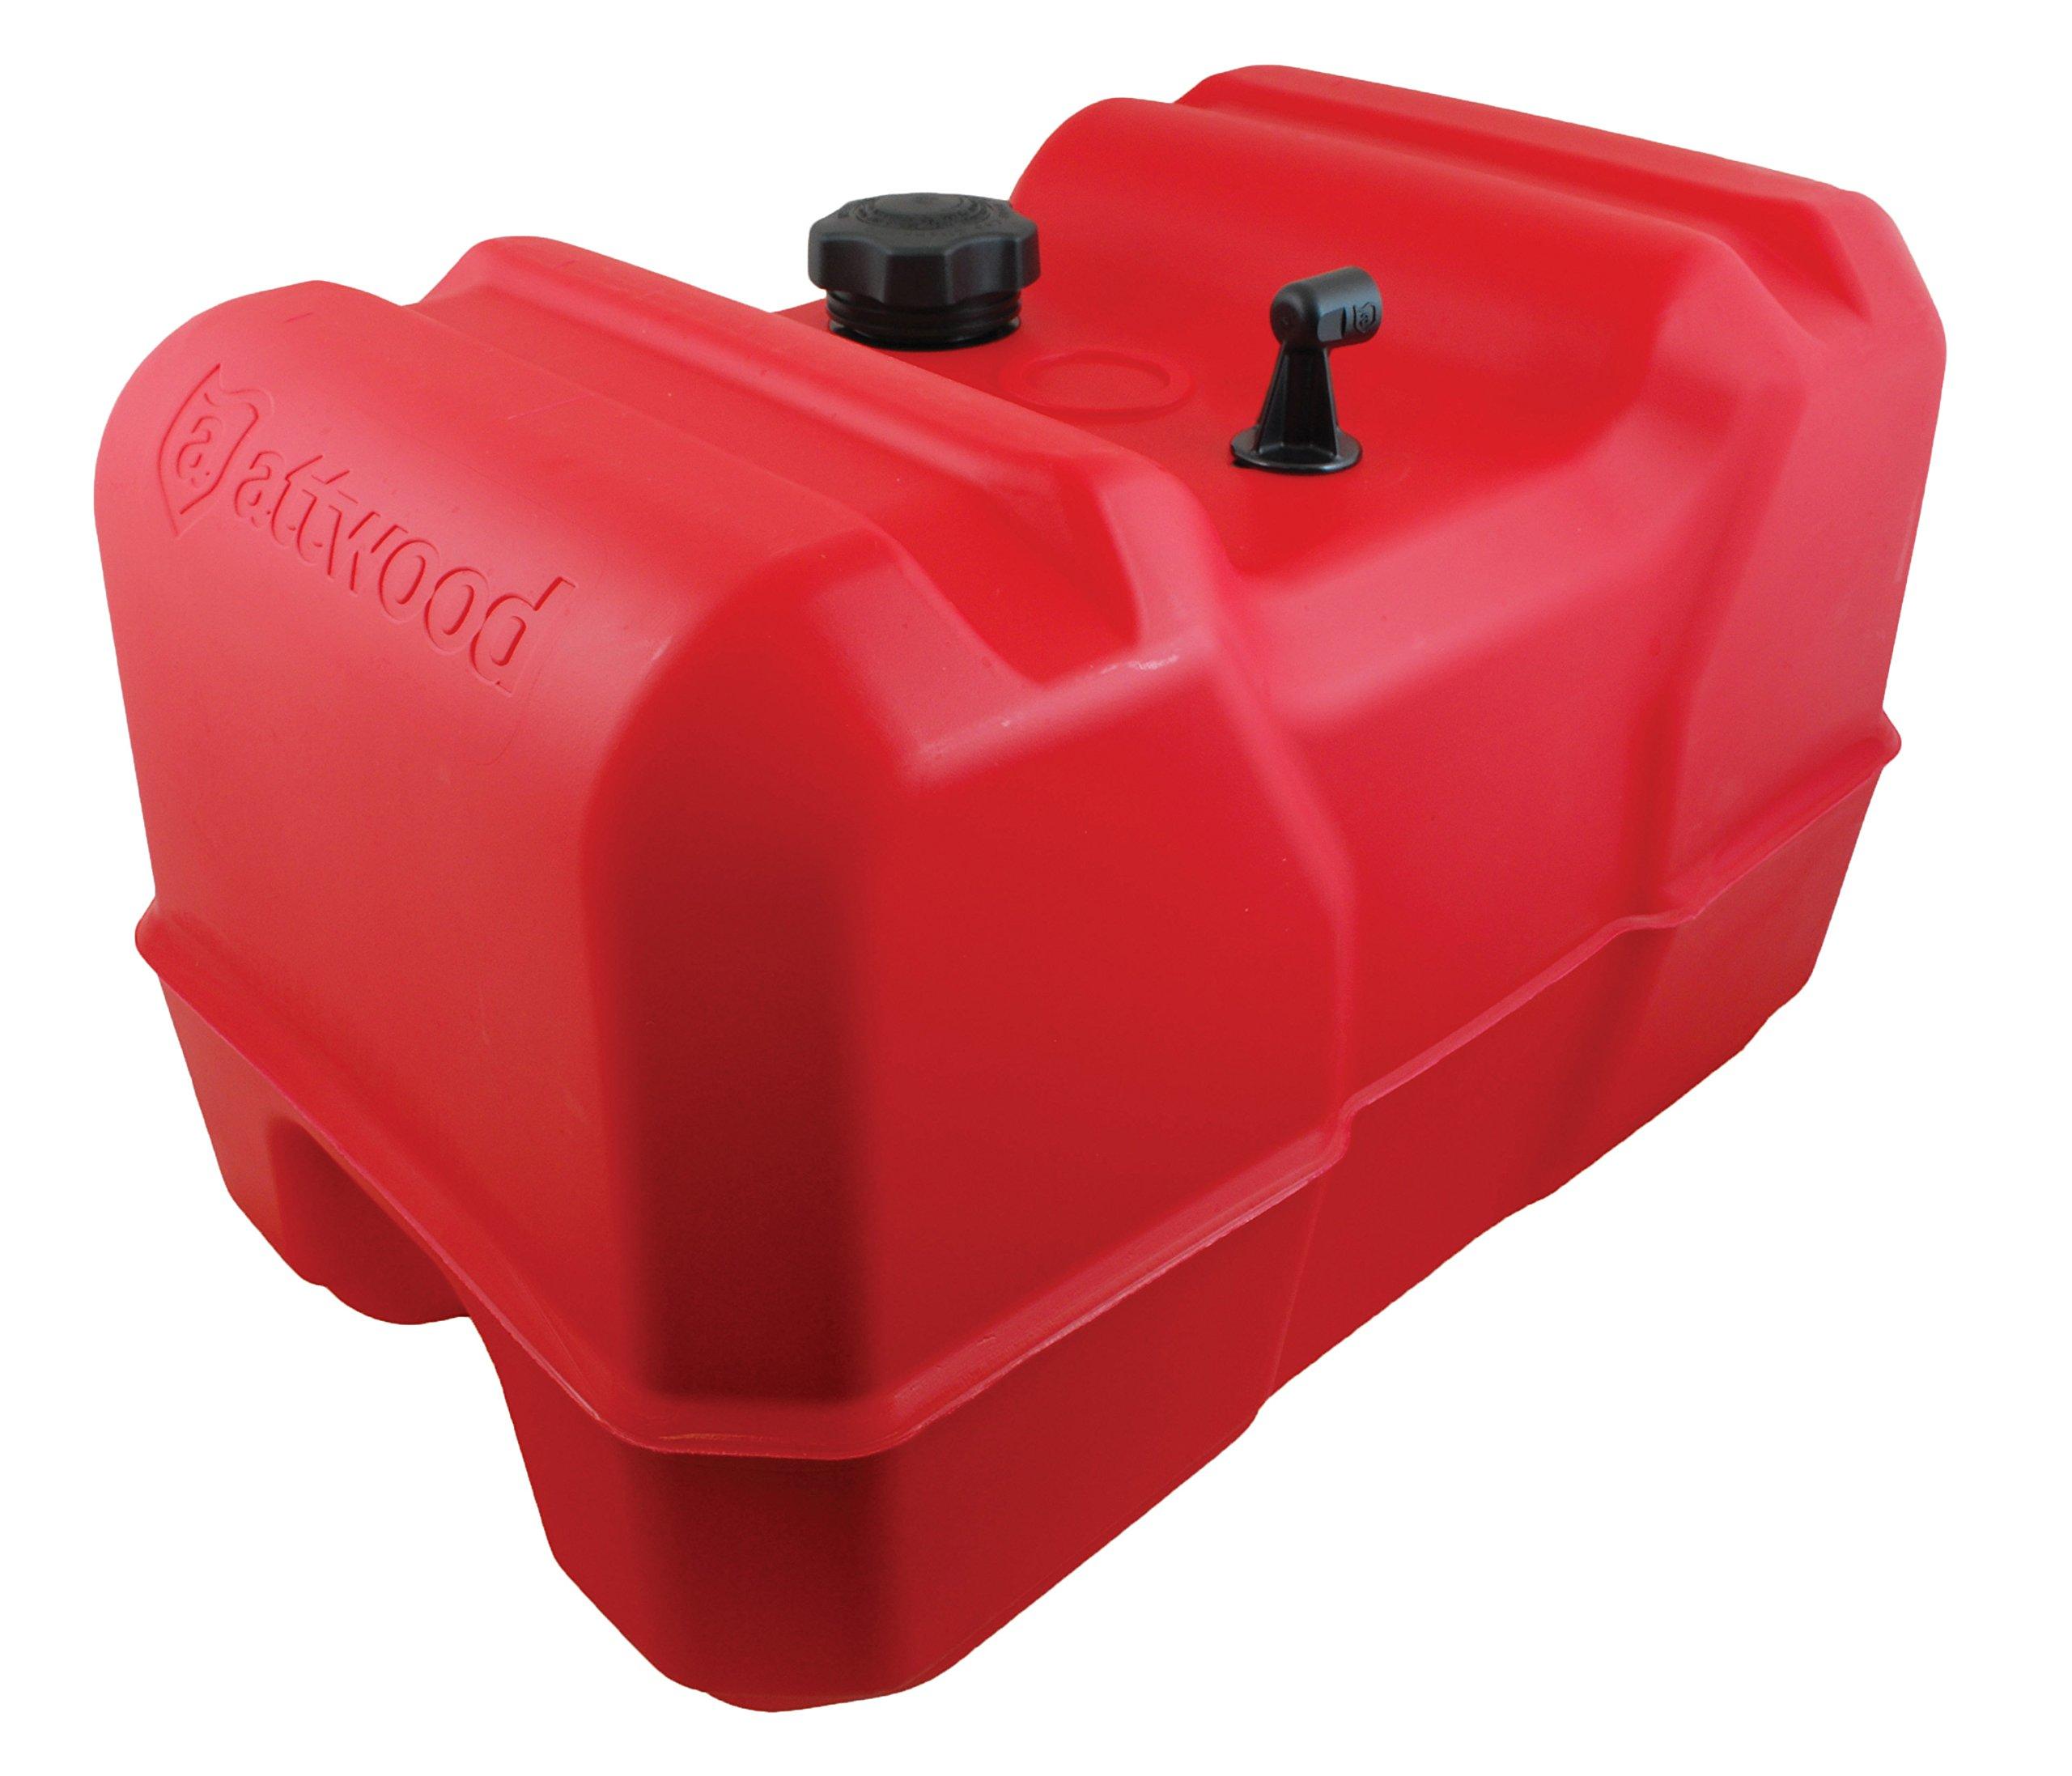 attwood 8812LP2 Epa Certified Portable Fuel Tank 12 gallon